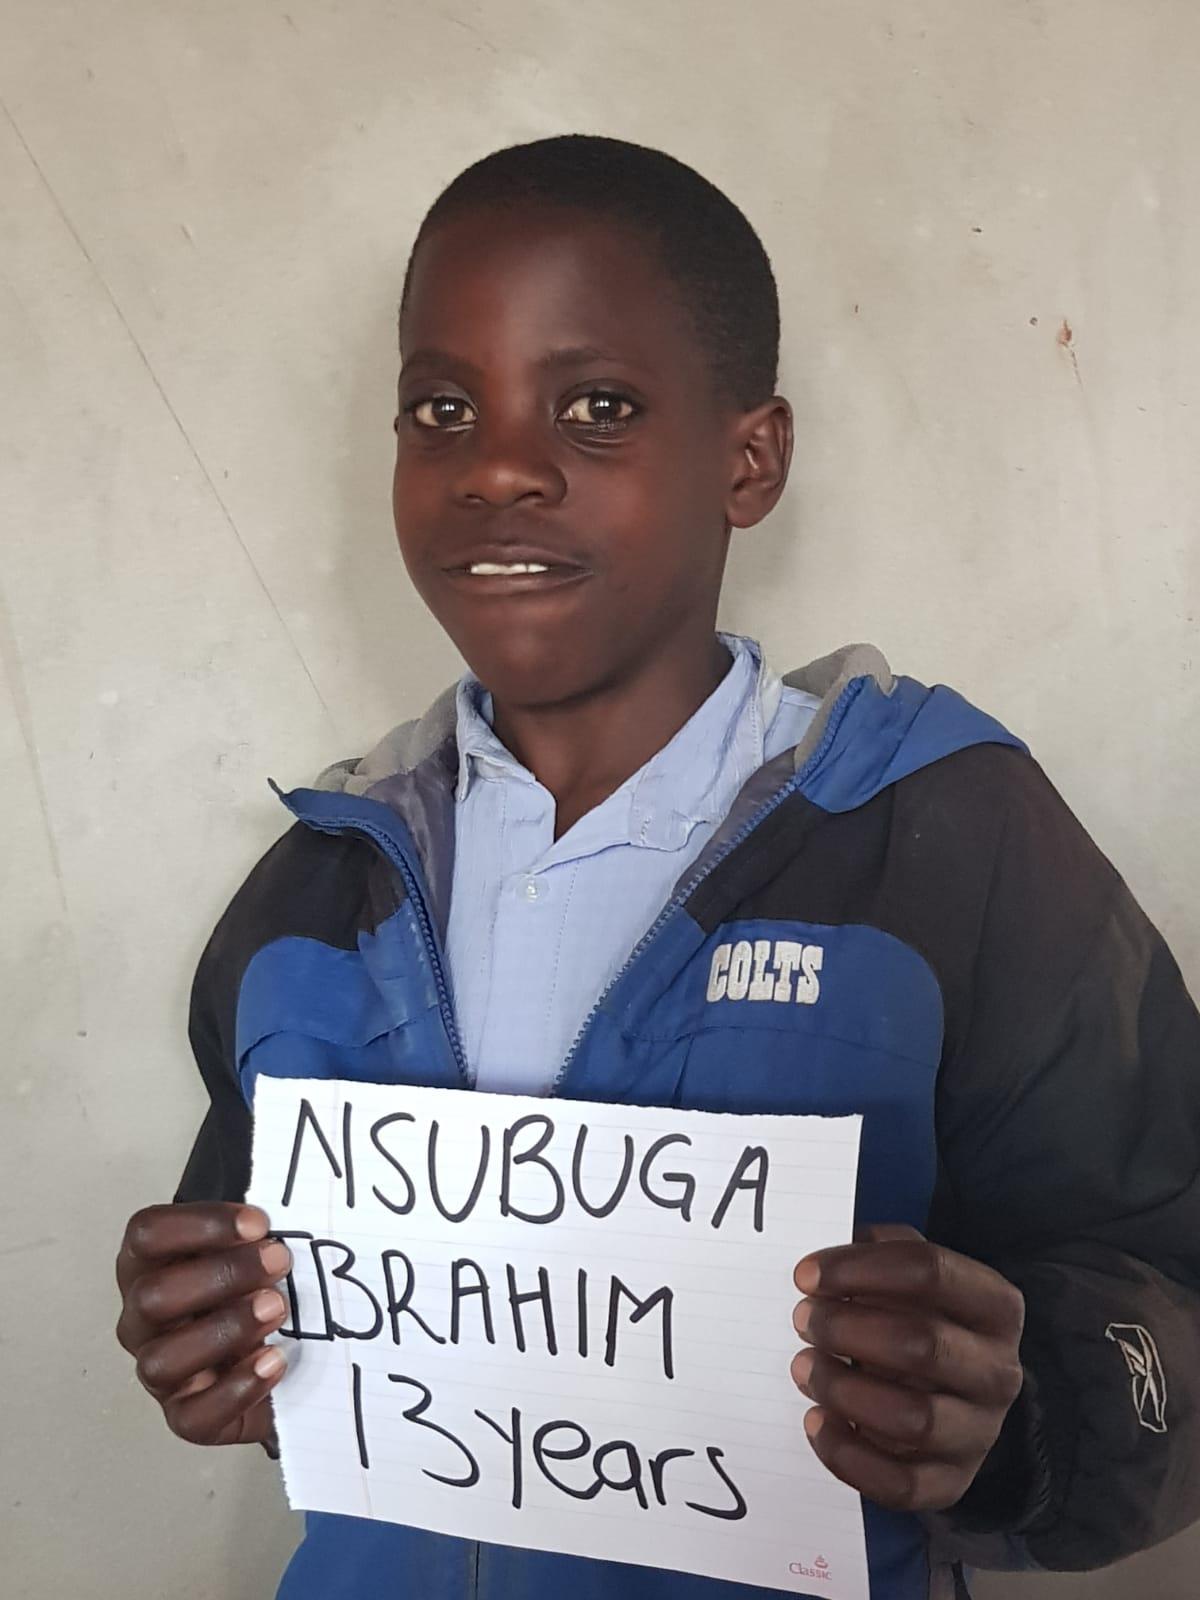 Nsubuga, Ibrahim